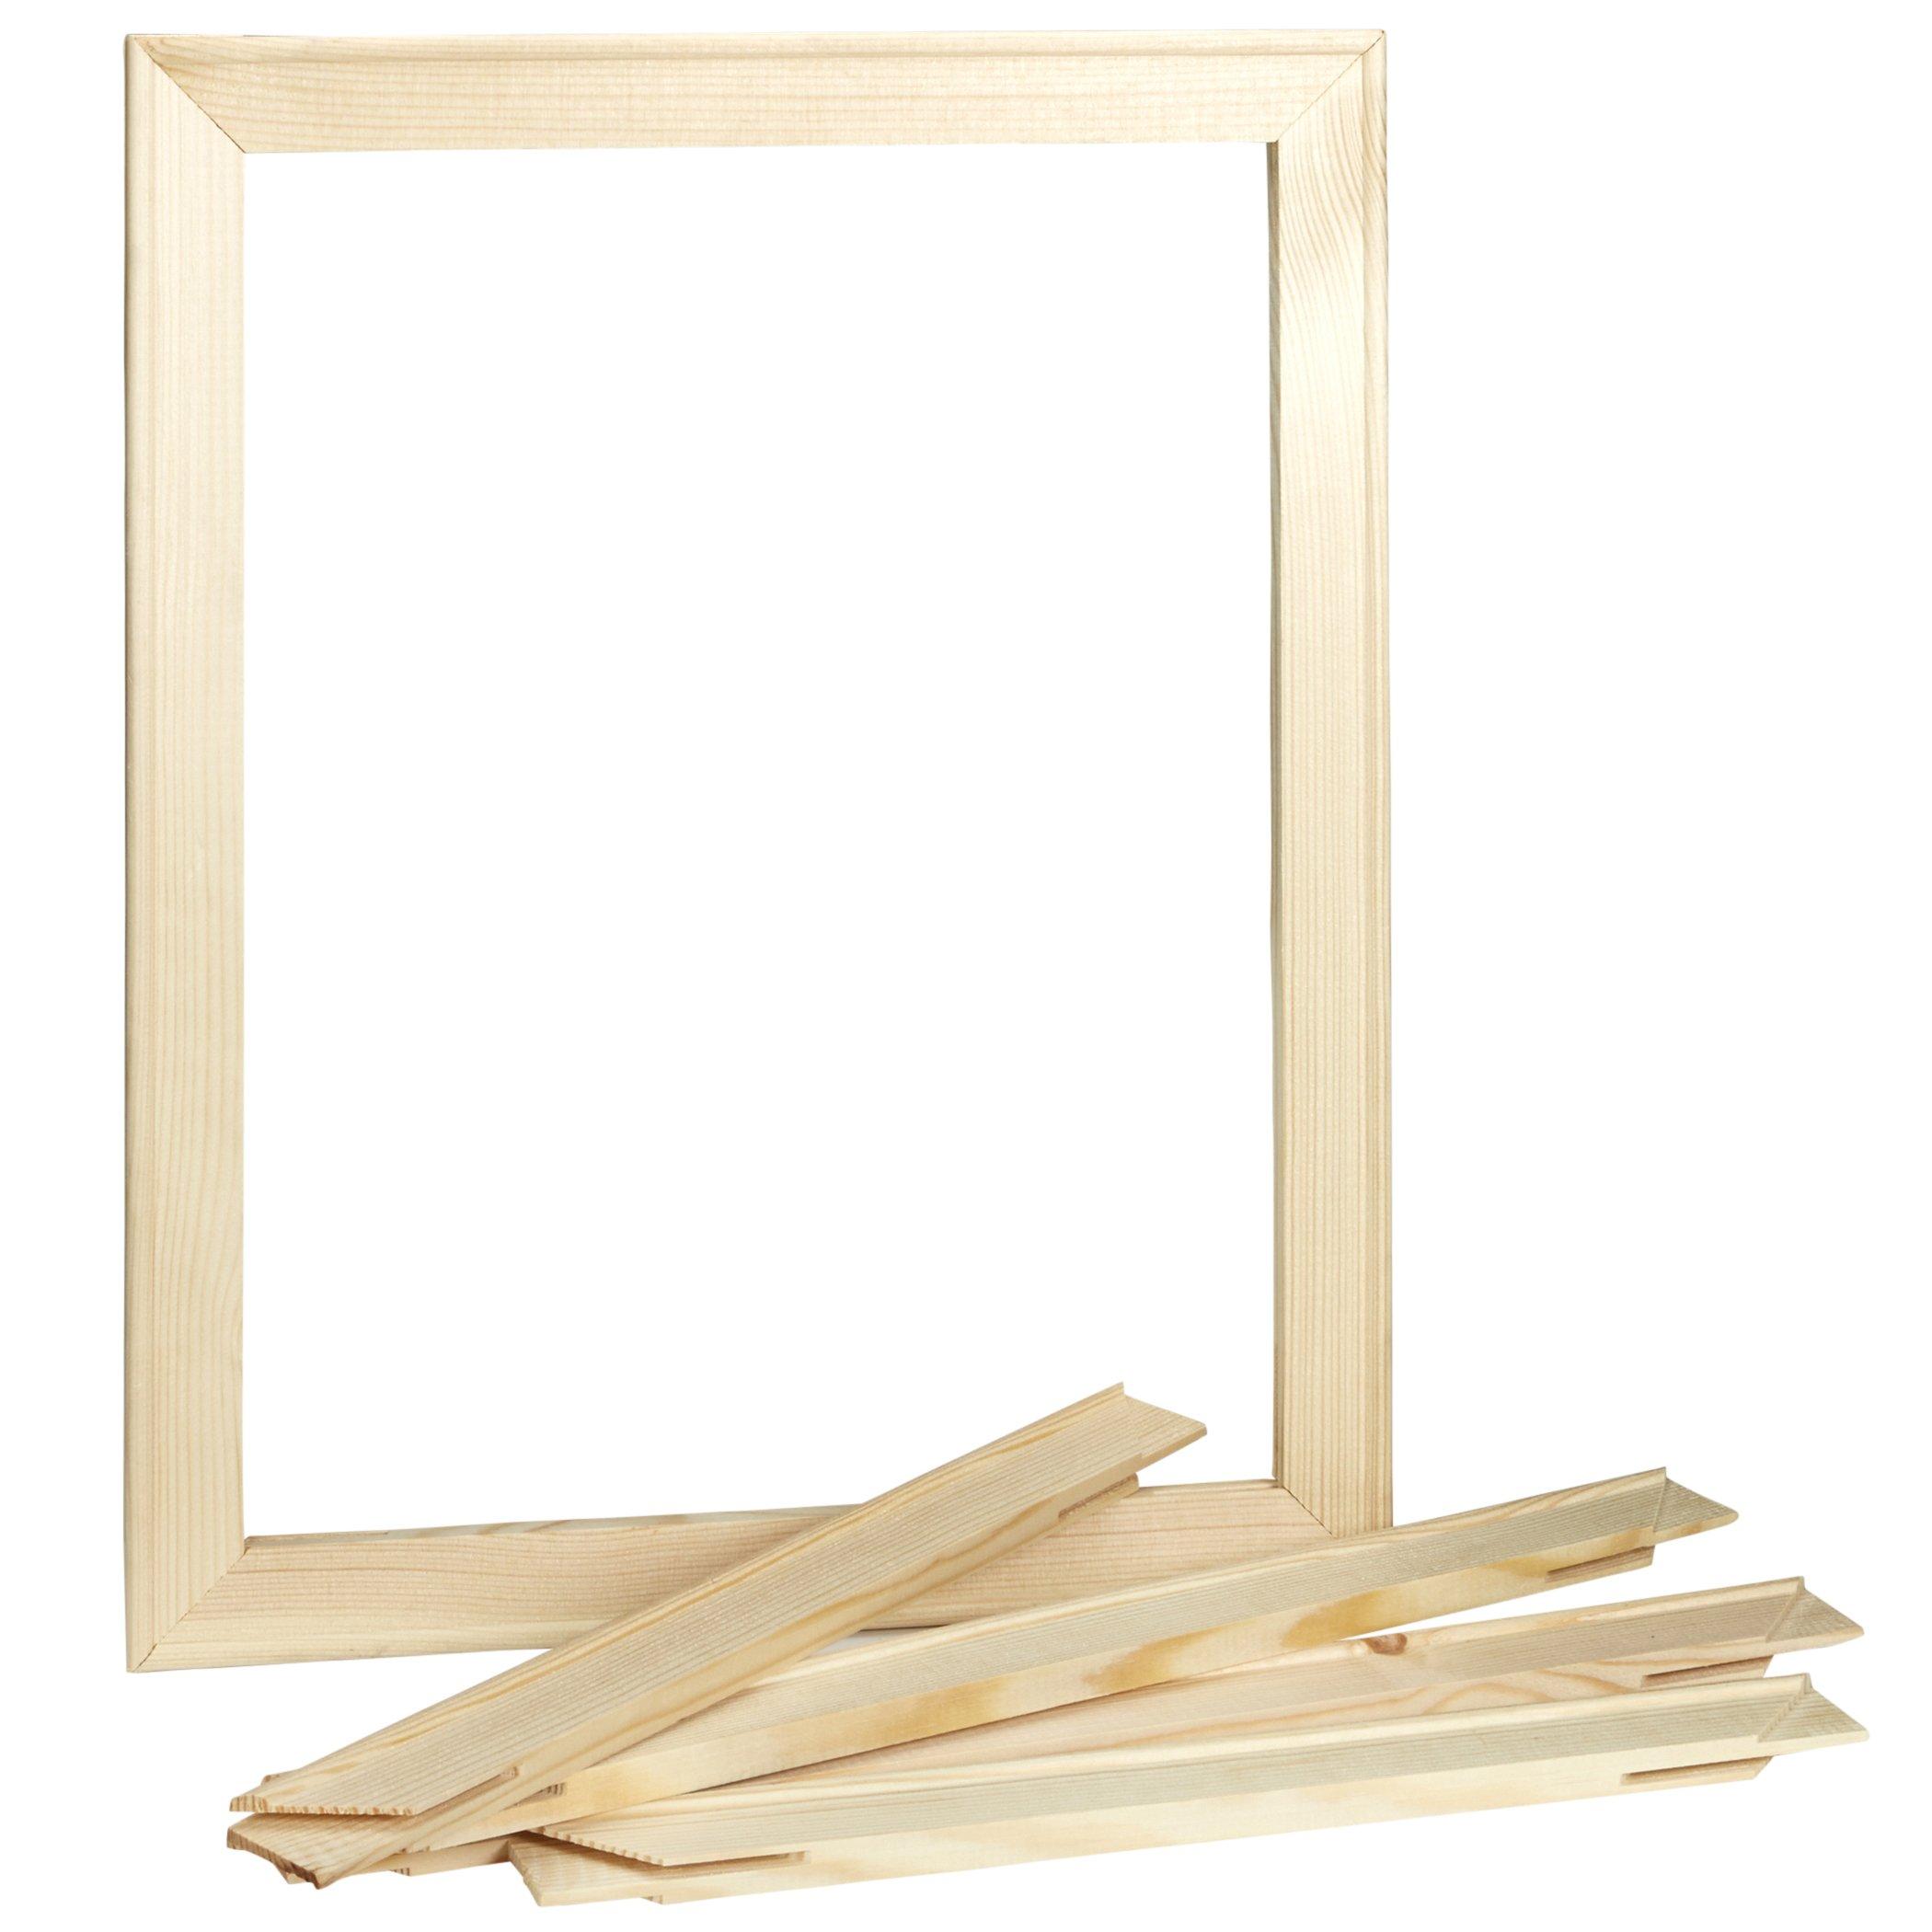 Artlicious - 4 Piece - 16x20 Stretched Canvas Stretcher Bar Strip ...